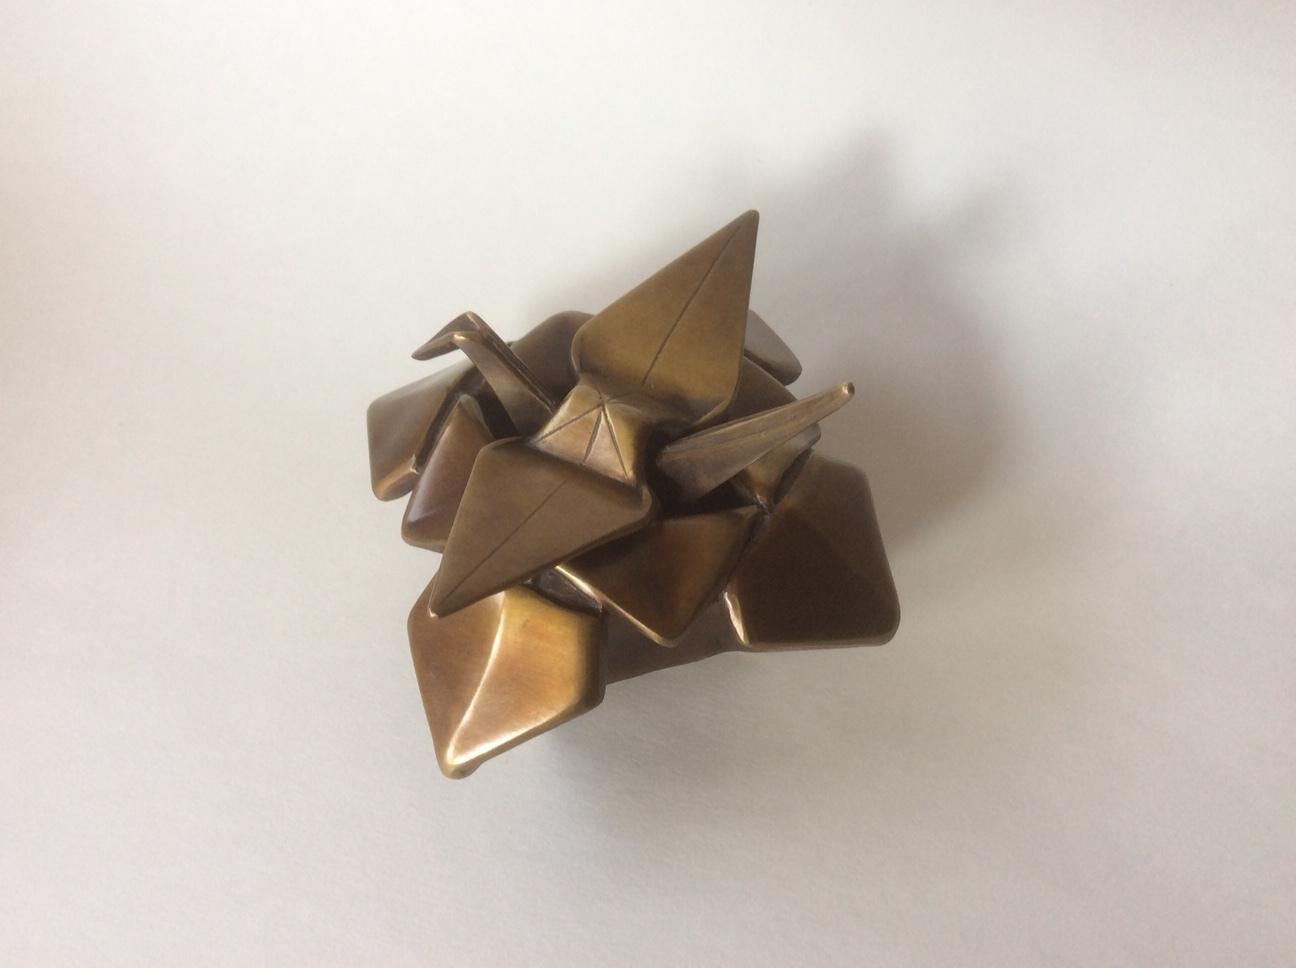 Origami Crane in Box